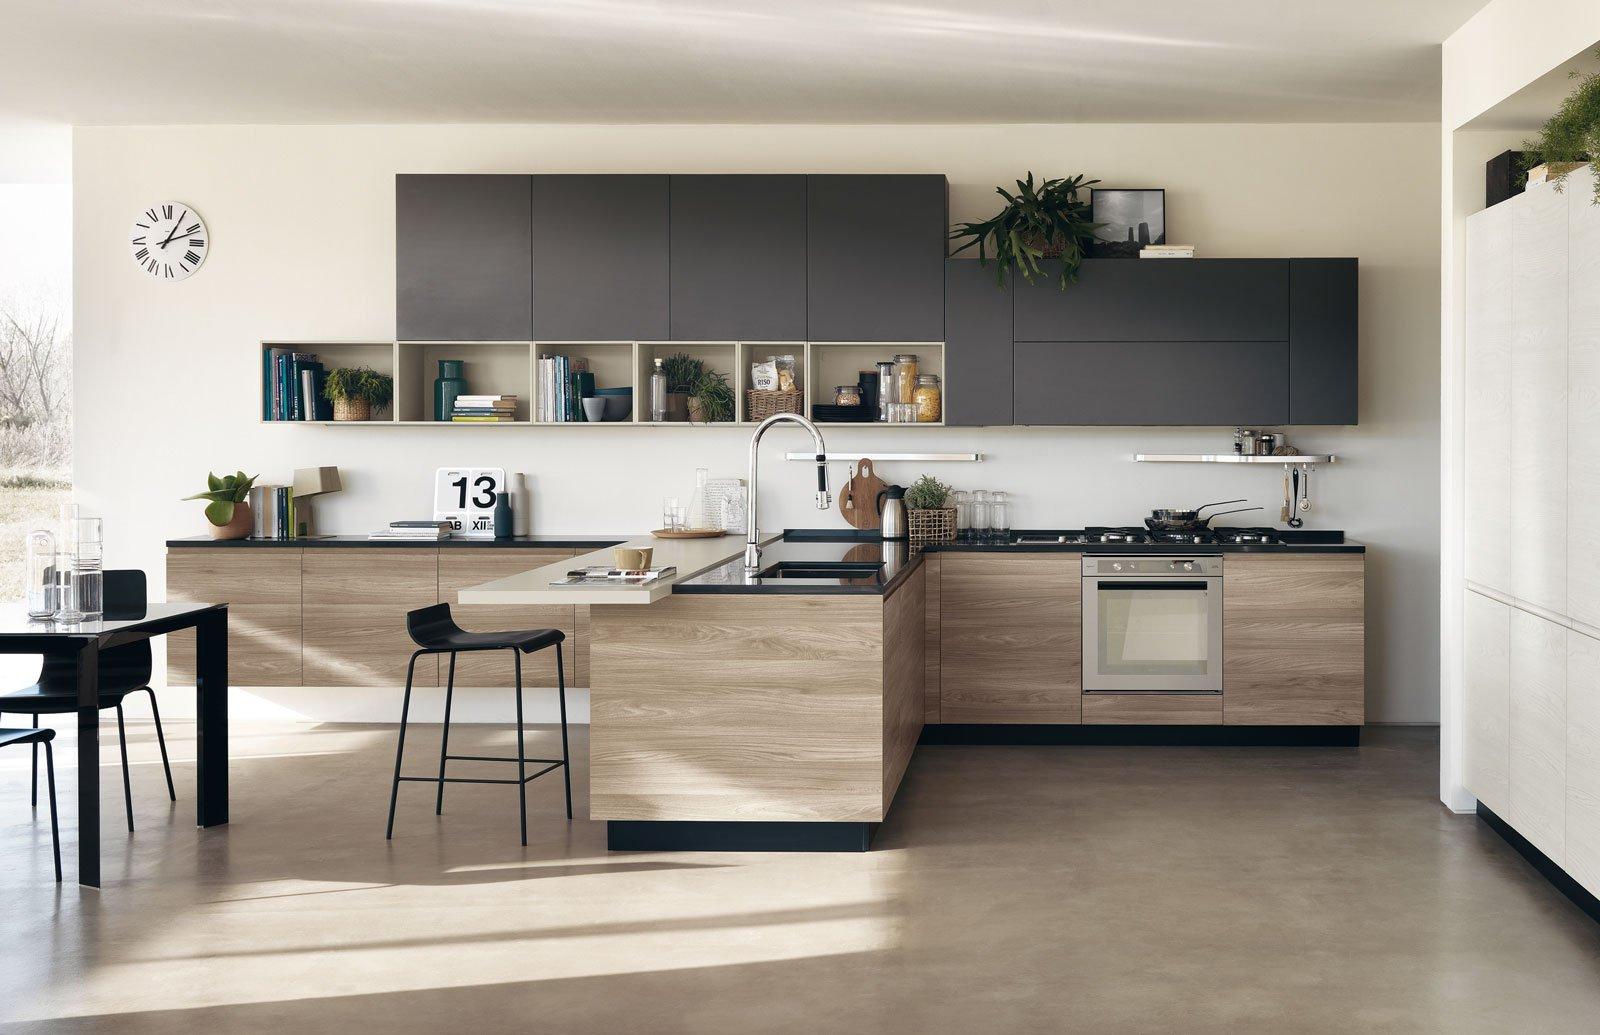 Cucina in melaminico economica resistente in tante versioni cose di casa - Foto cucine moderne ...